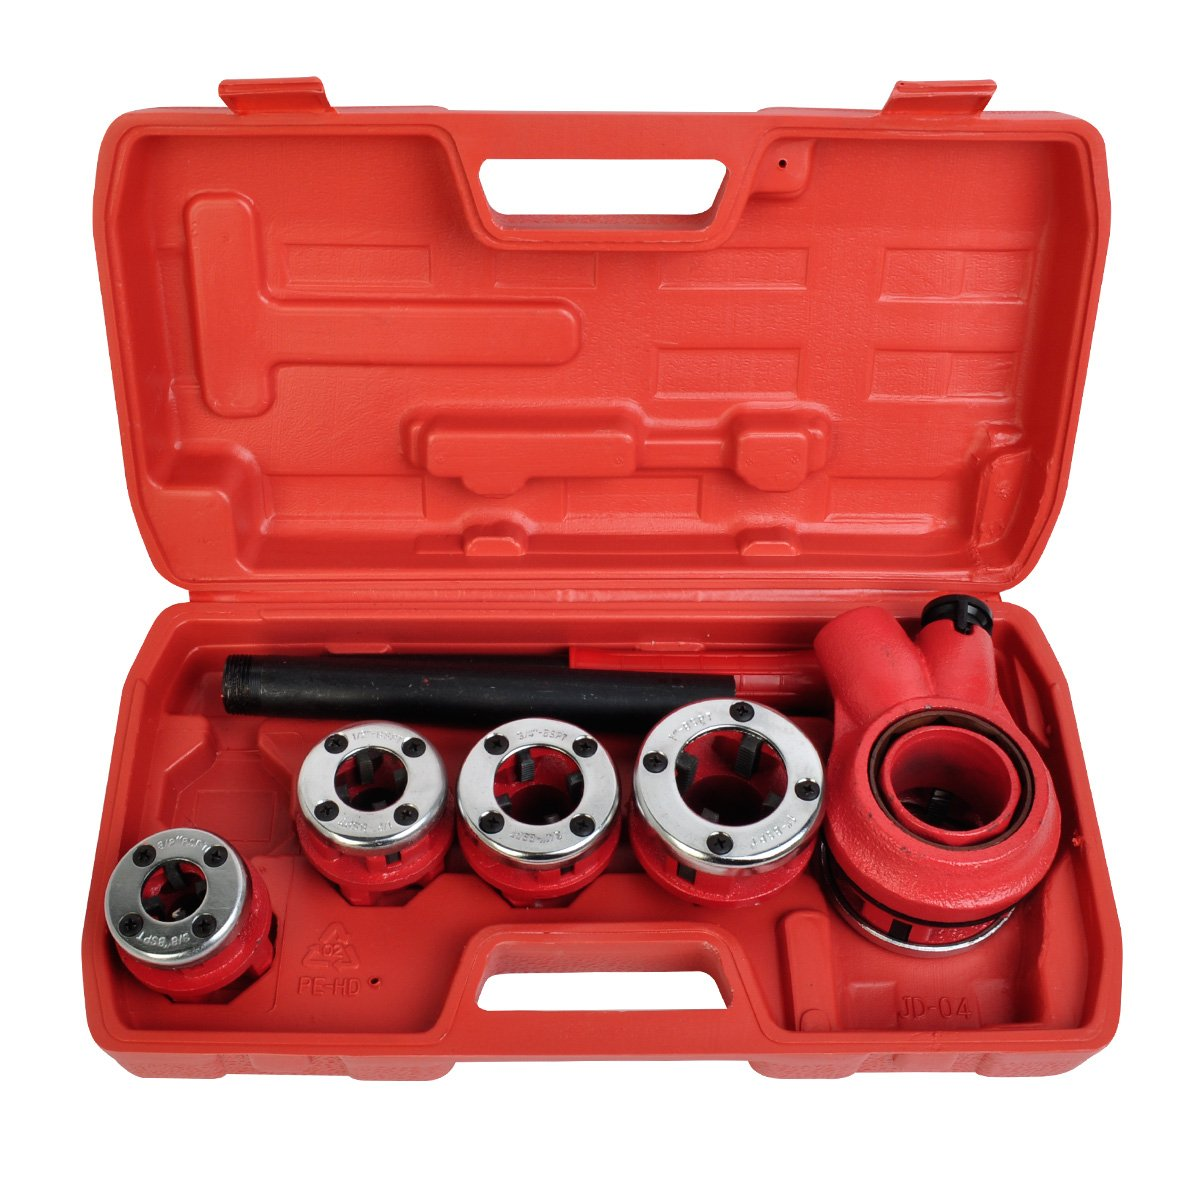 Comie New Ratchet Pipe Threader Kit Set Ratcheting w/5 Stock Dies & Handle Plumbing Case by Comie